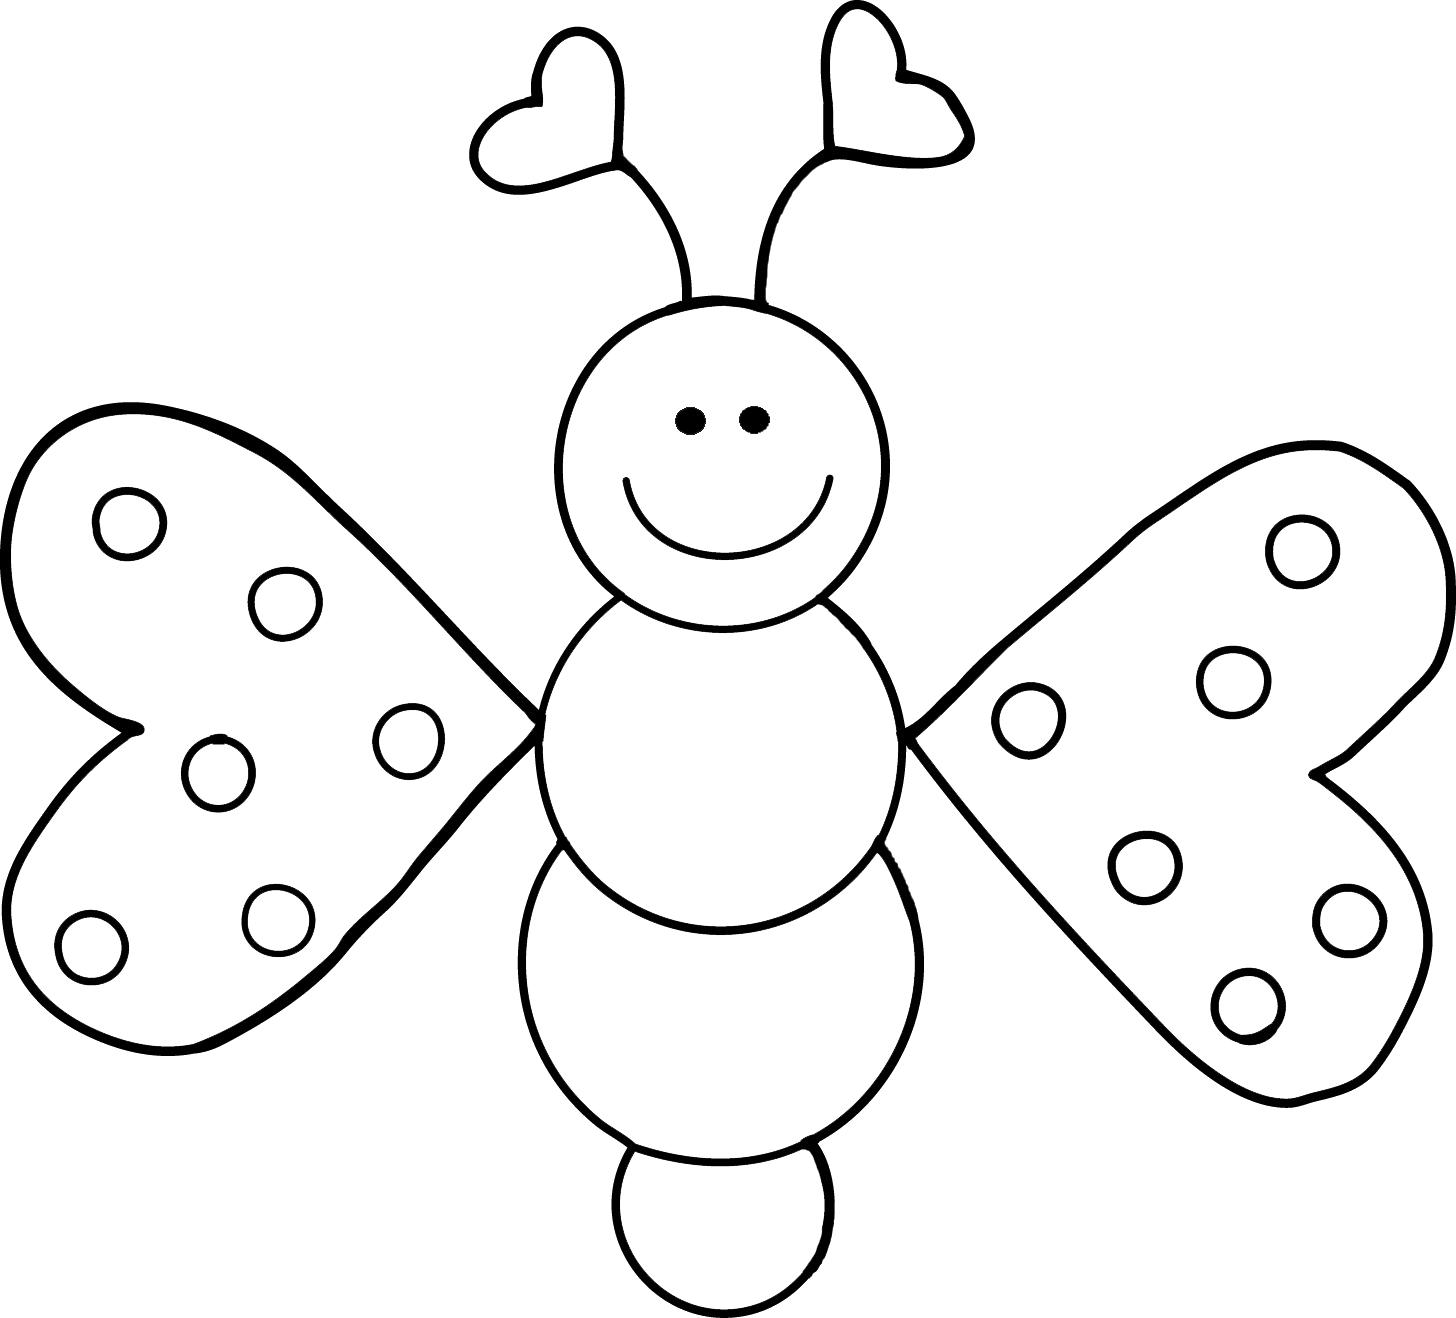 Love Bugs Freebie Clip Art Butterfly Coloring Page Coloring Pages Cartoon Butterfly [ 1318 x 1456 Pixel ]